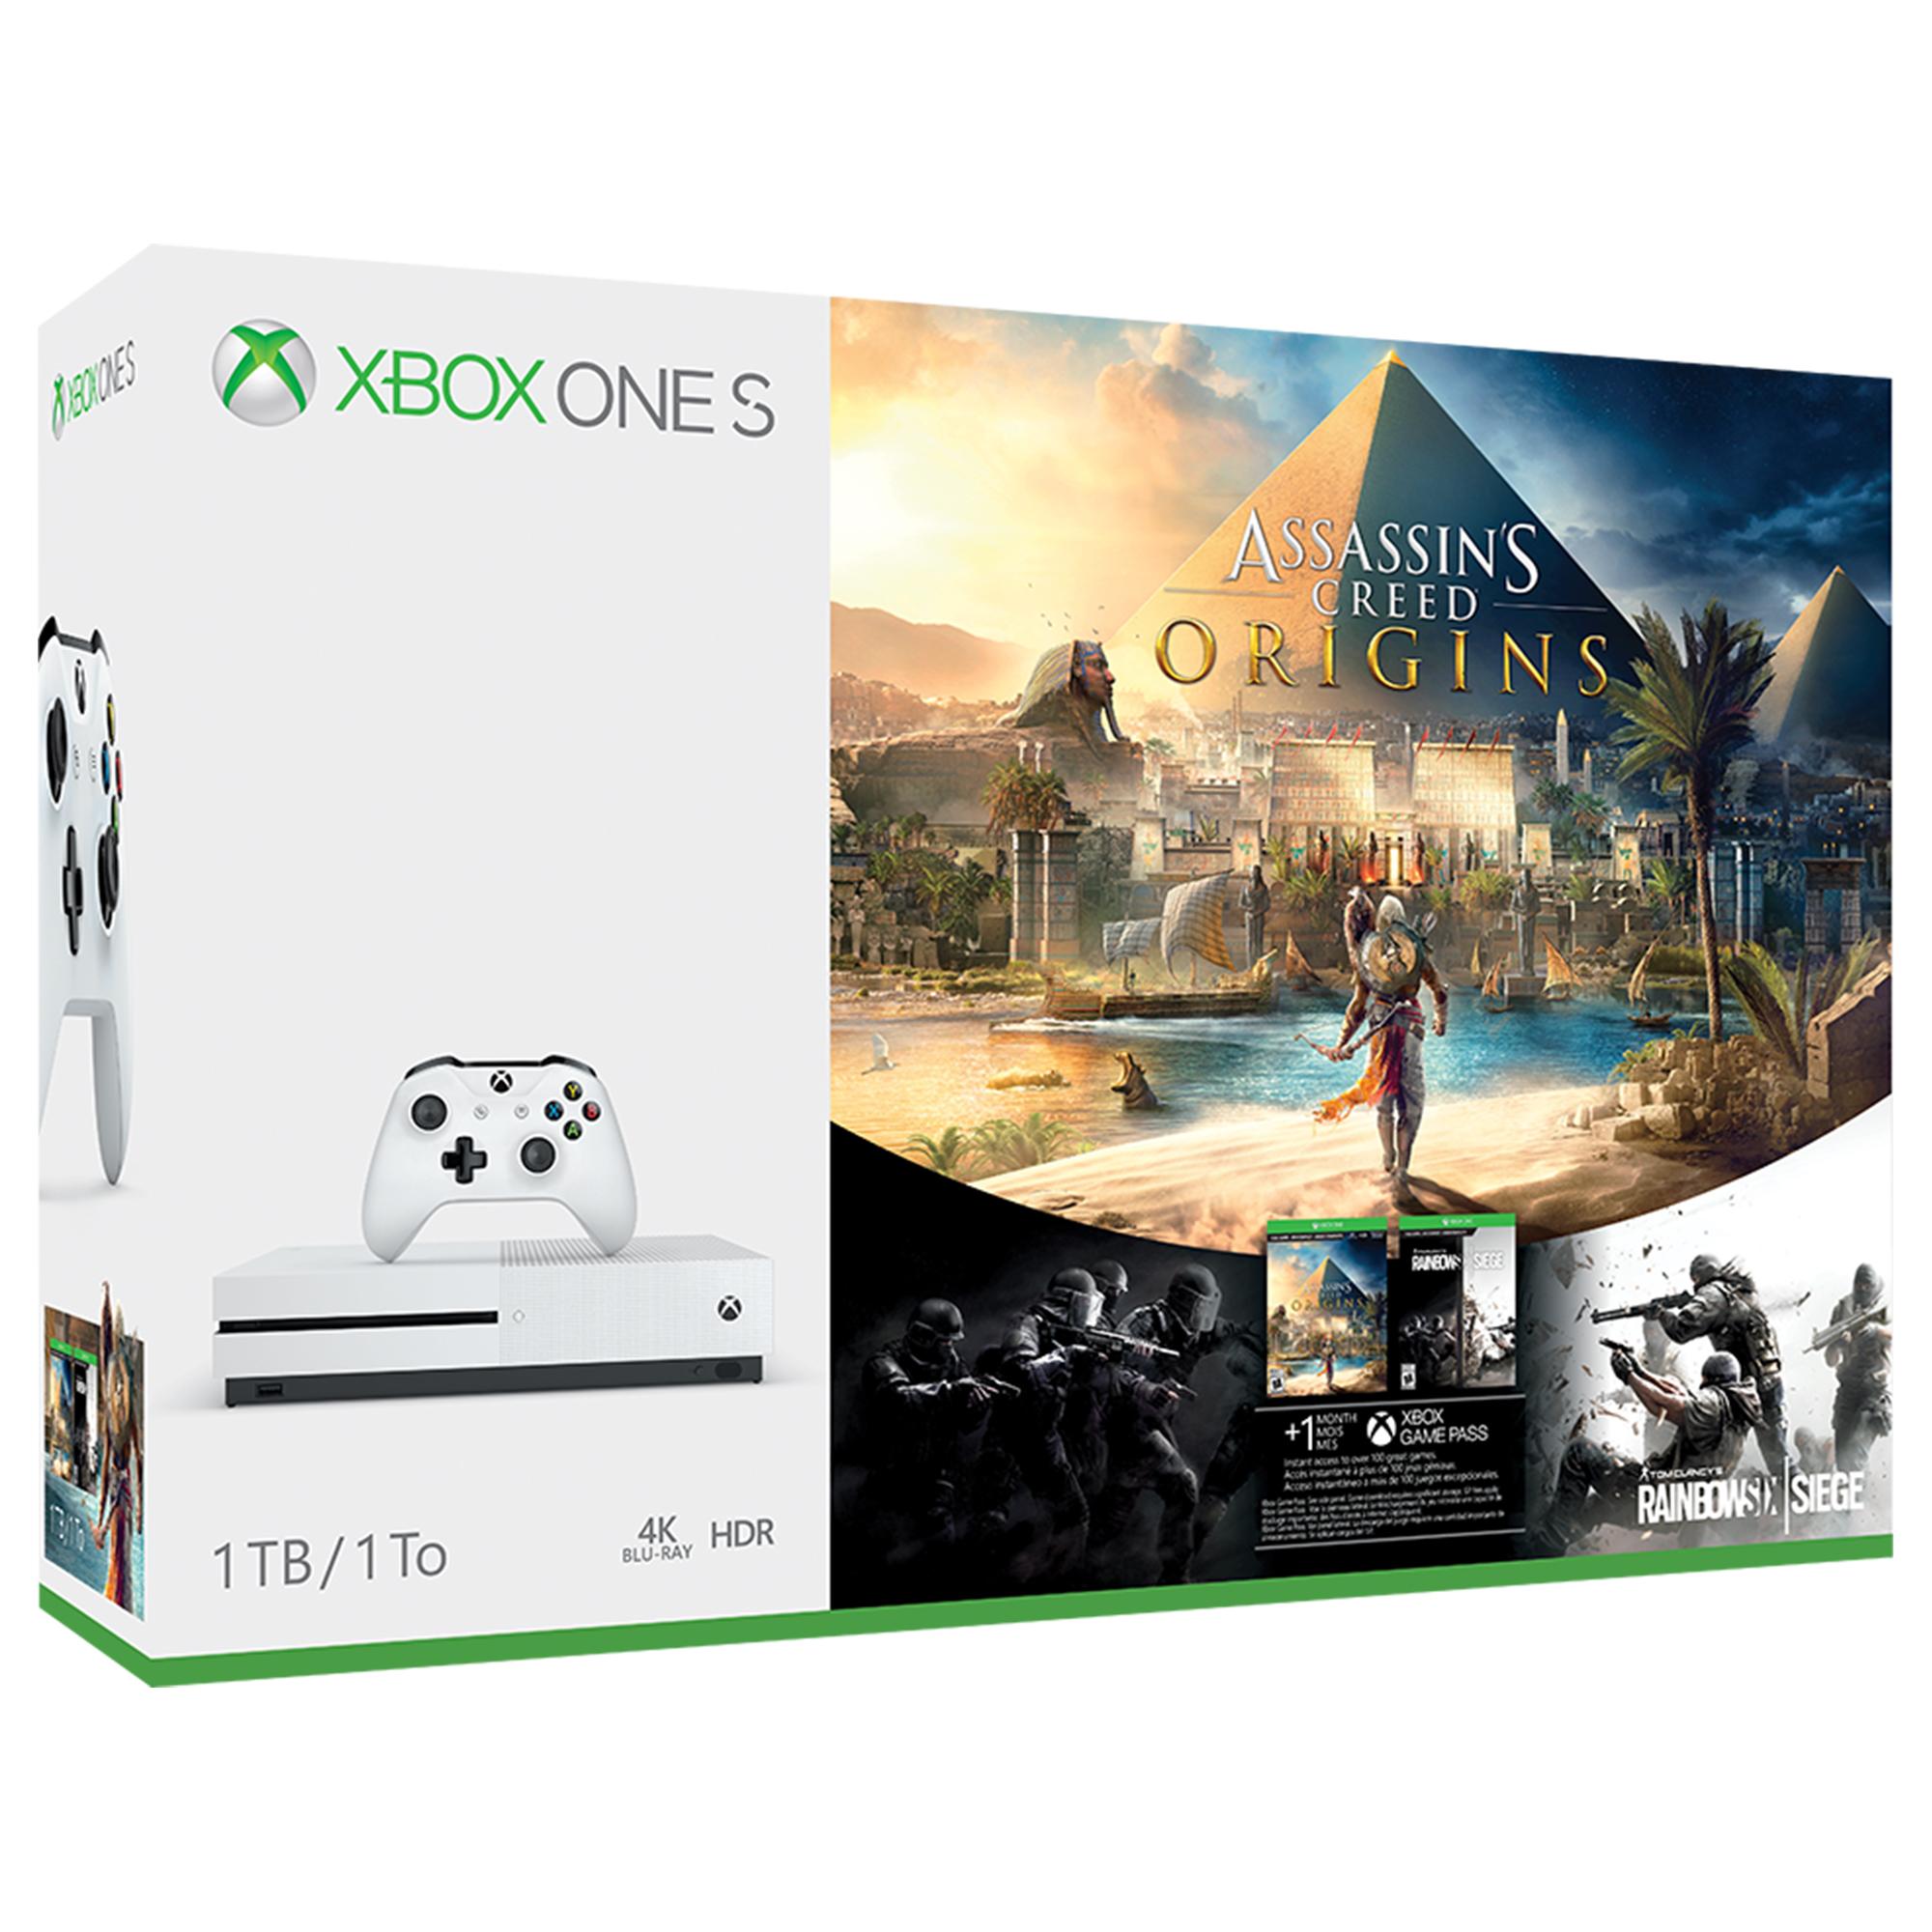 Microsoft Xbox One S 1TB Assassin's Creed Origins Bonus Bundle, White, 234-00226